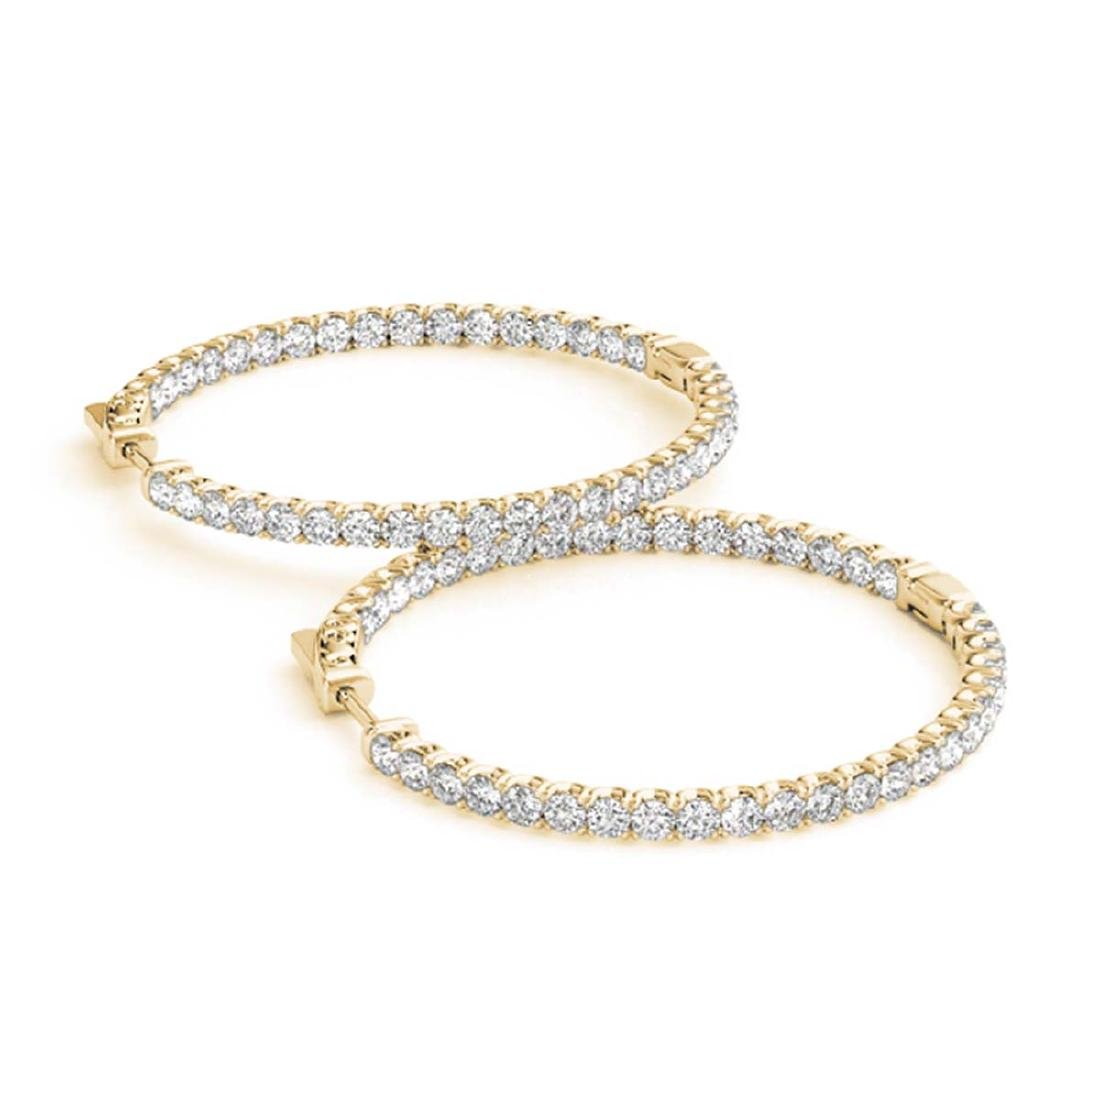 7 ctw Diamond VS/SI 56 mm Hoop Earrings 14K Yellow Gold